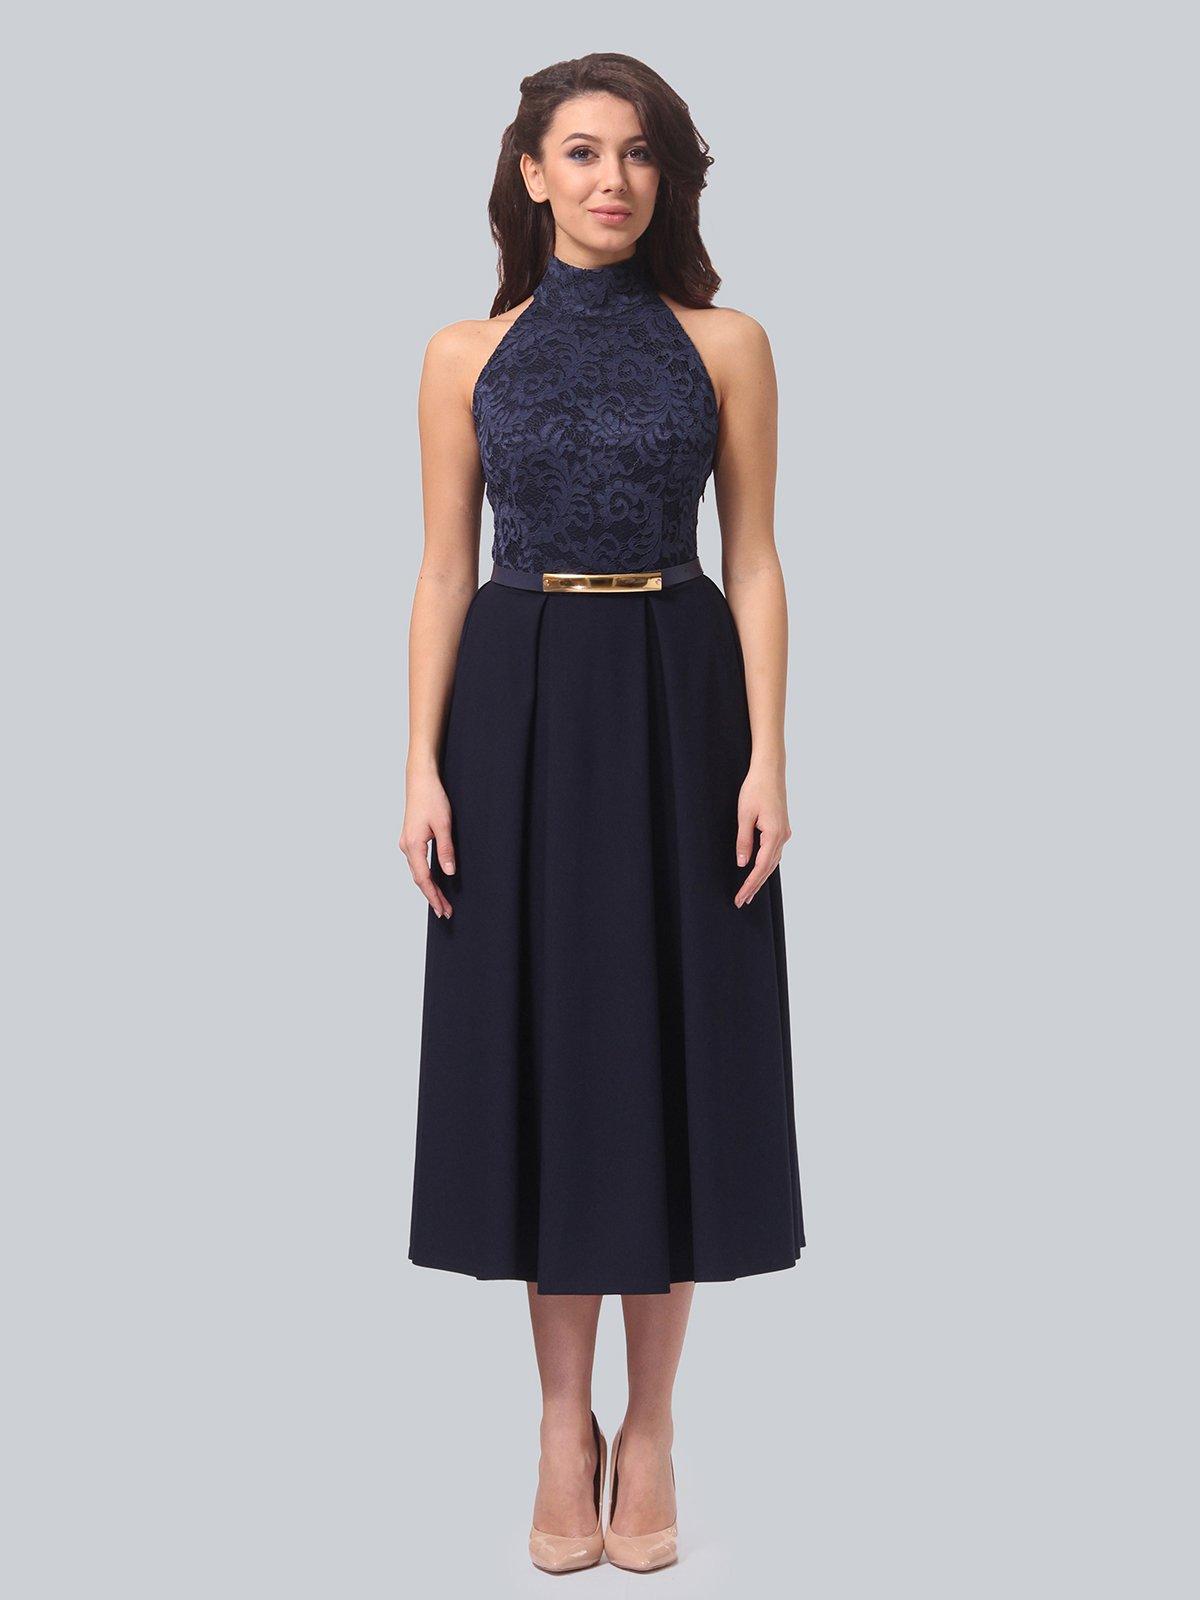 Платье темно-синее | 3851913 | фото 3